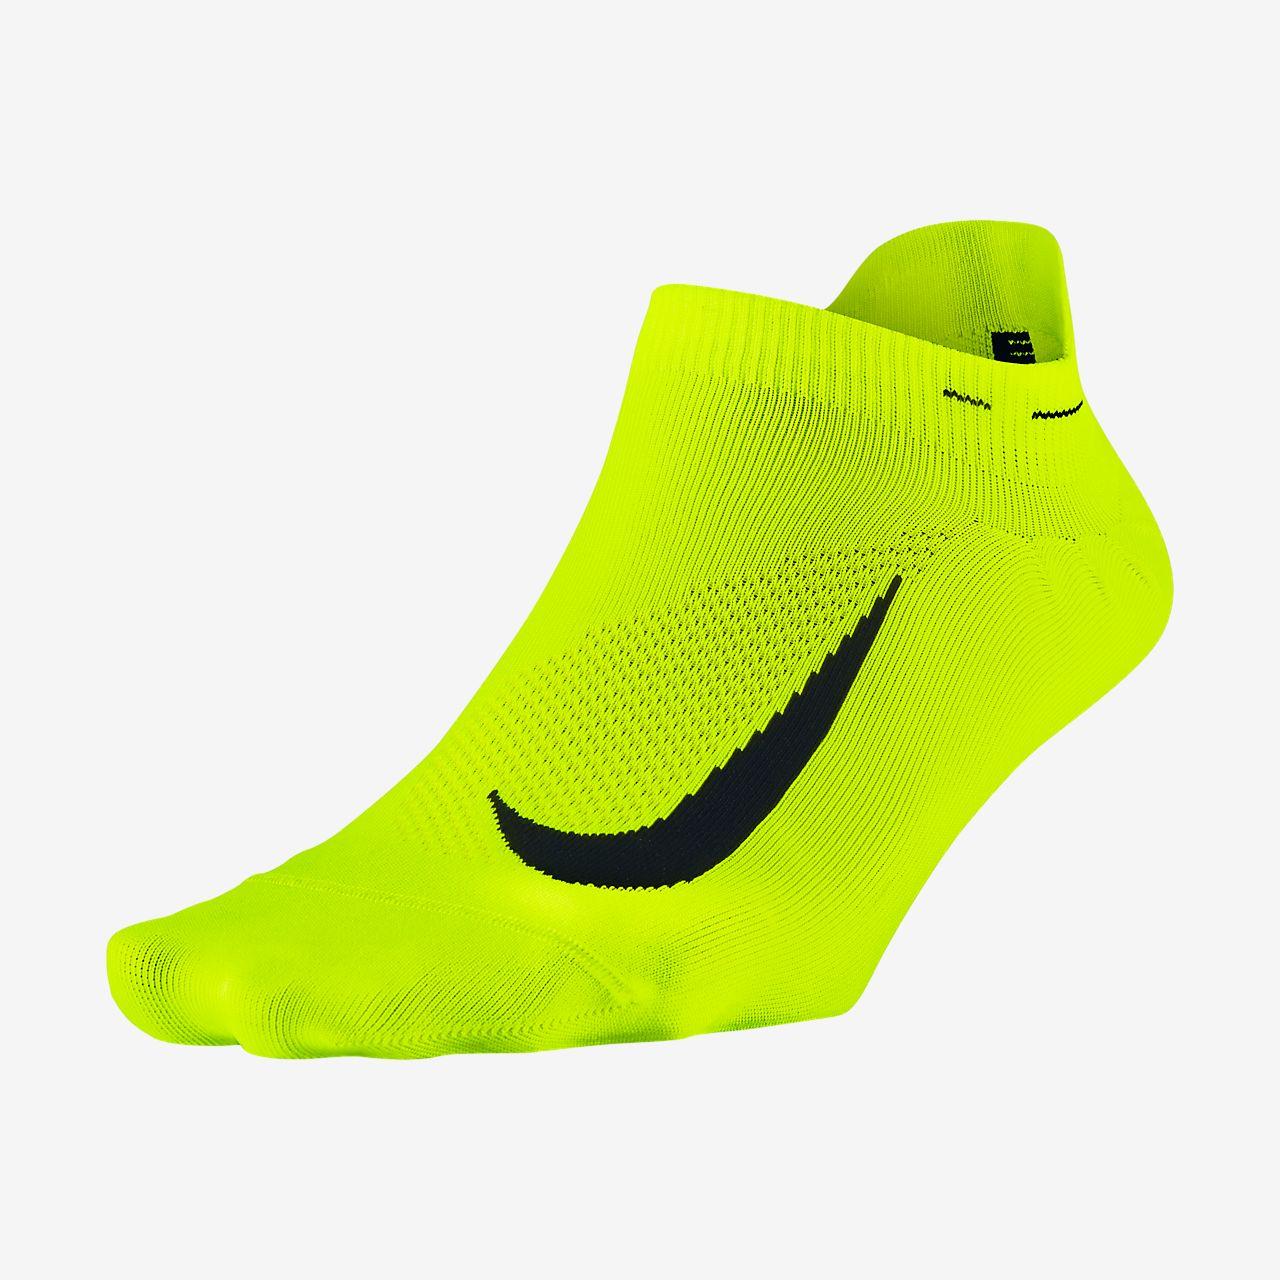 c0c2eb7cadb30 Nike Elite Lightweight No-Show Tab Running Socks